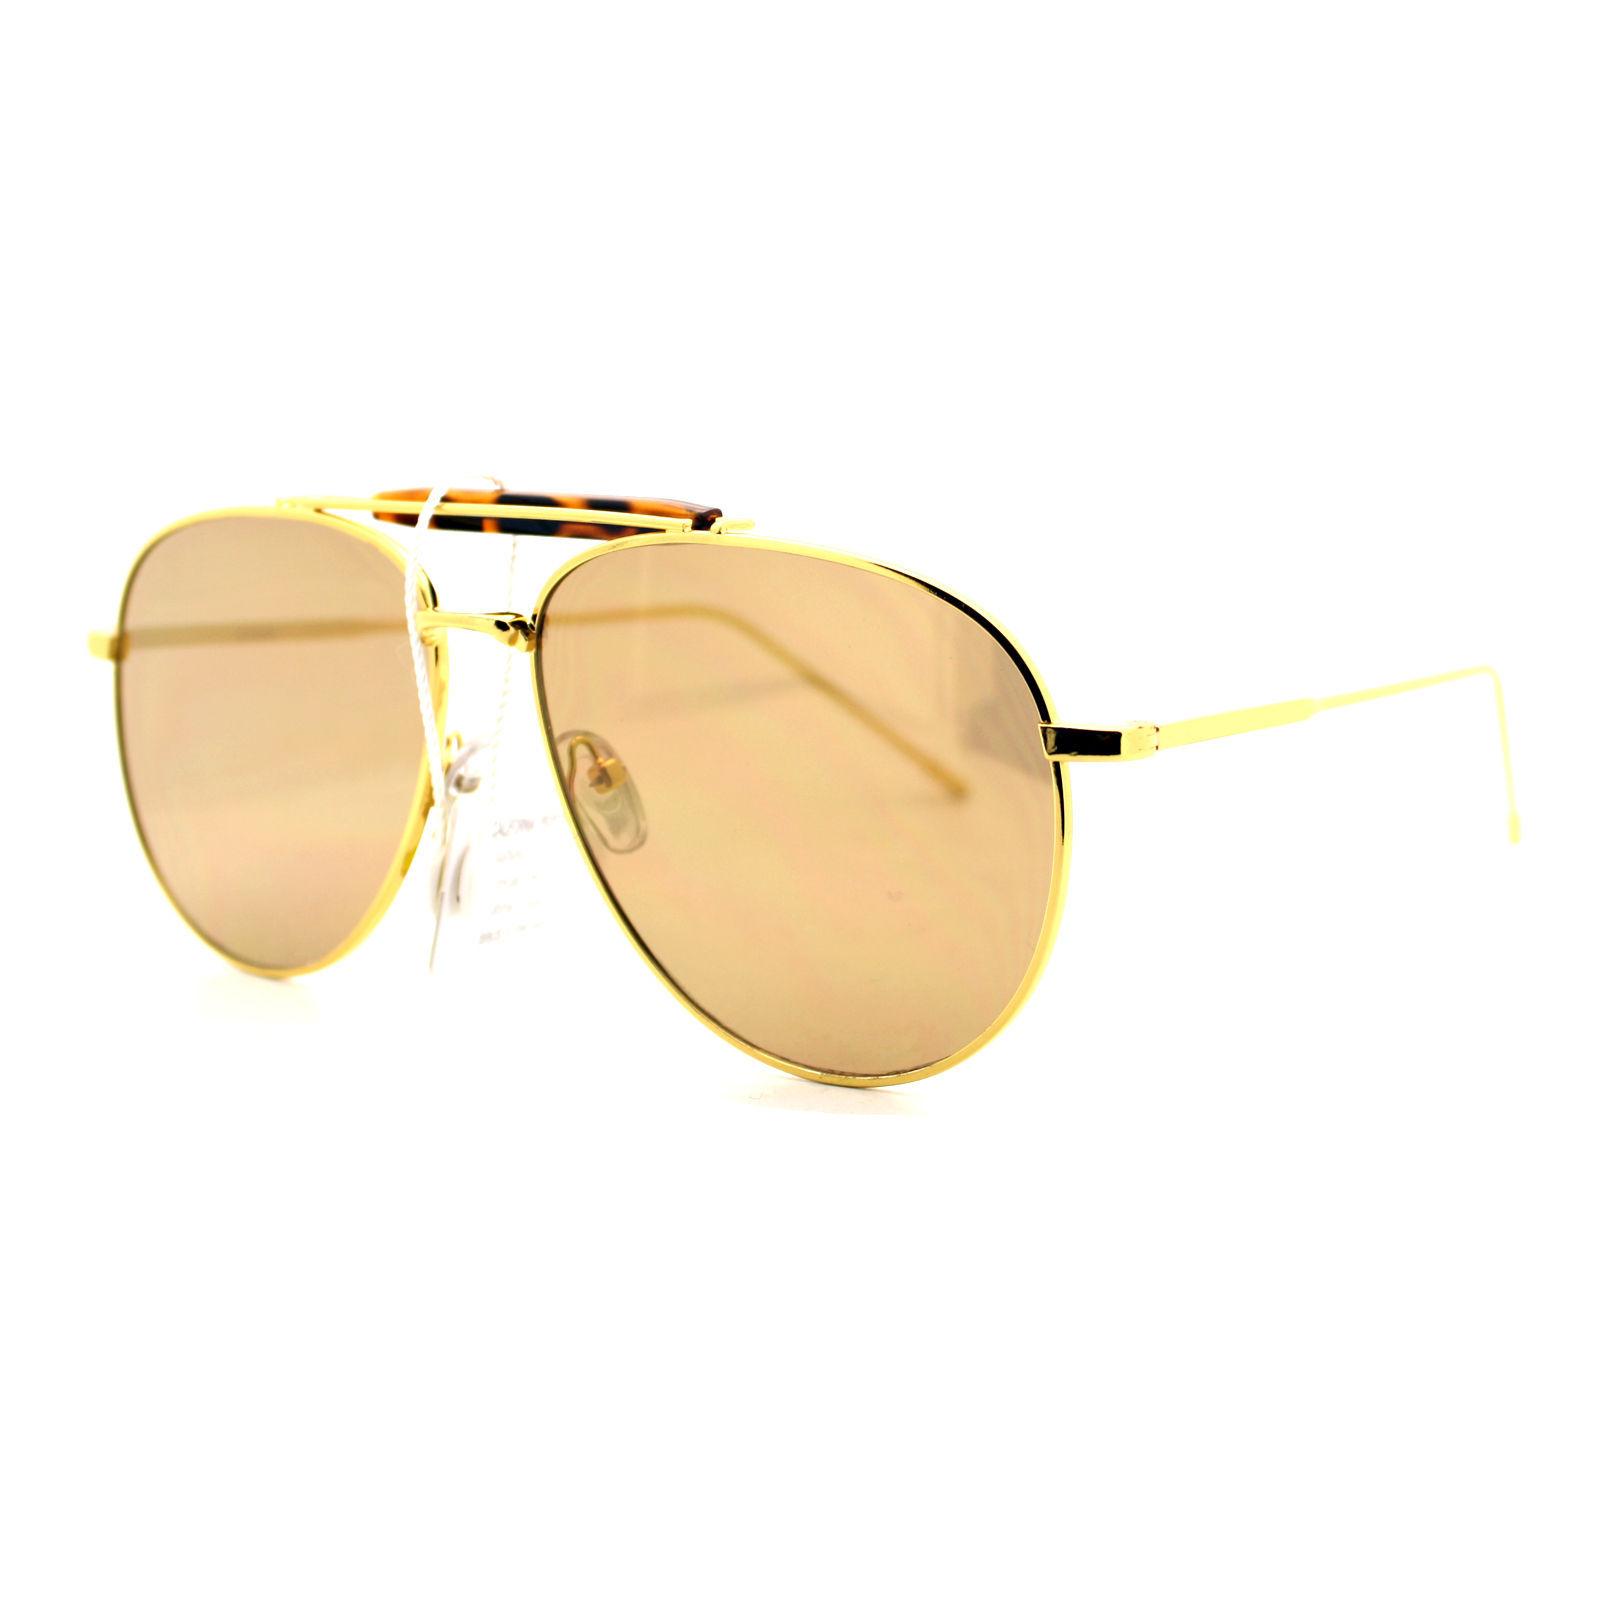 New Flat Lens Aviator Sunglasses Vintage Retro Top Bar Metal Aviators